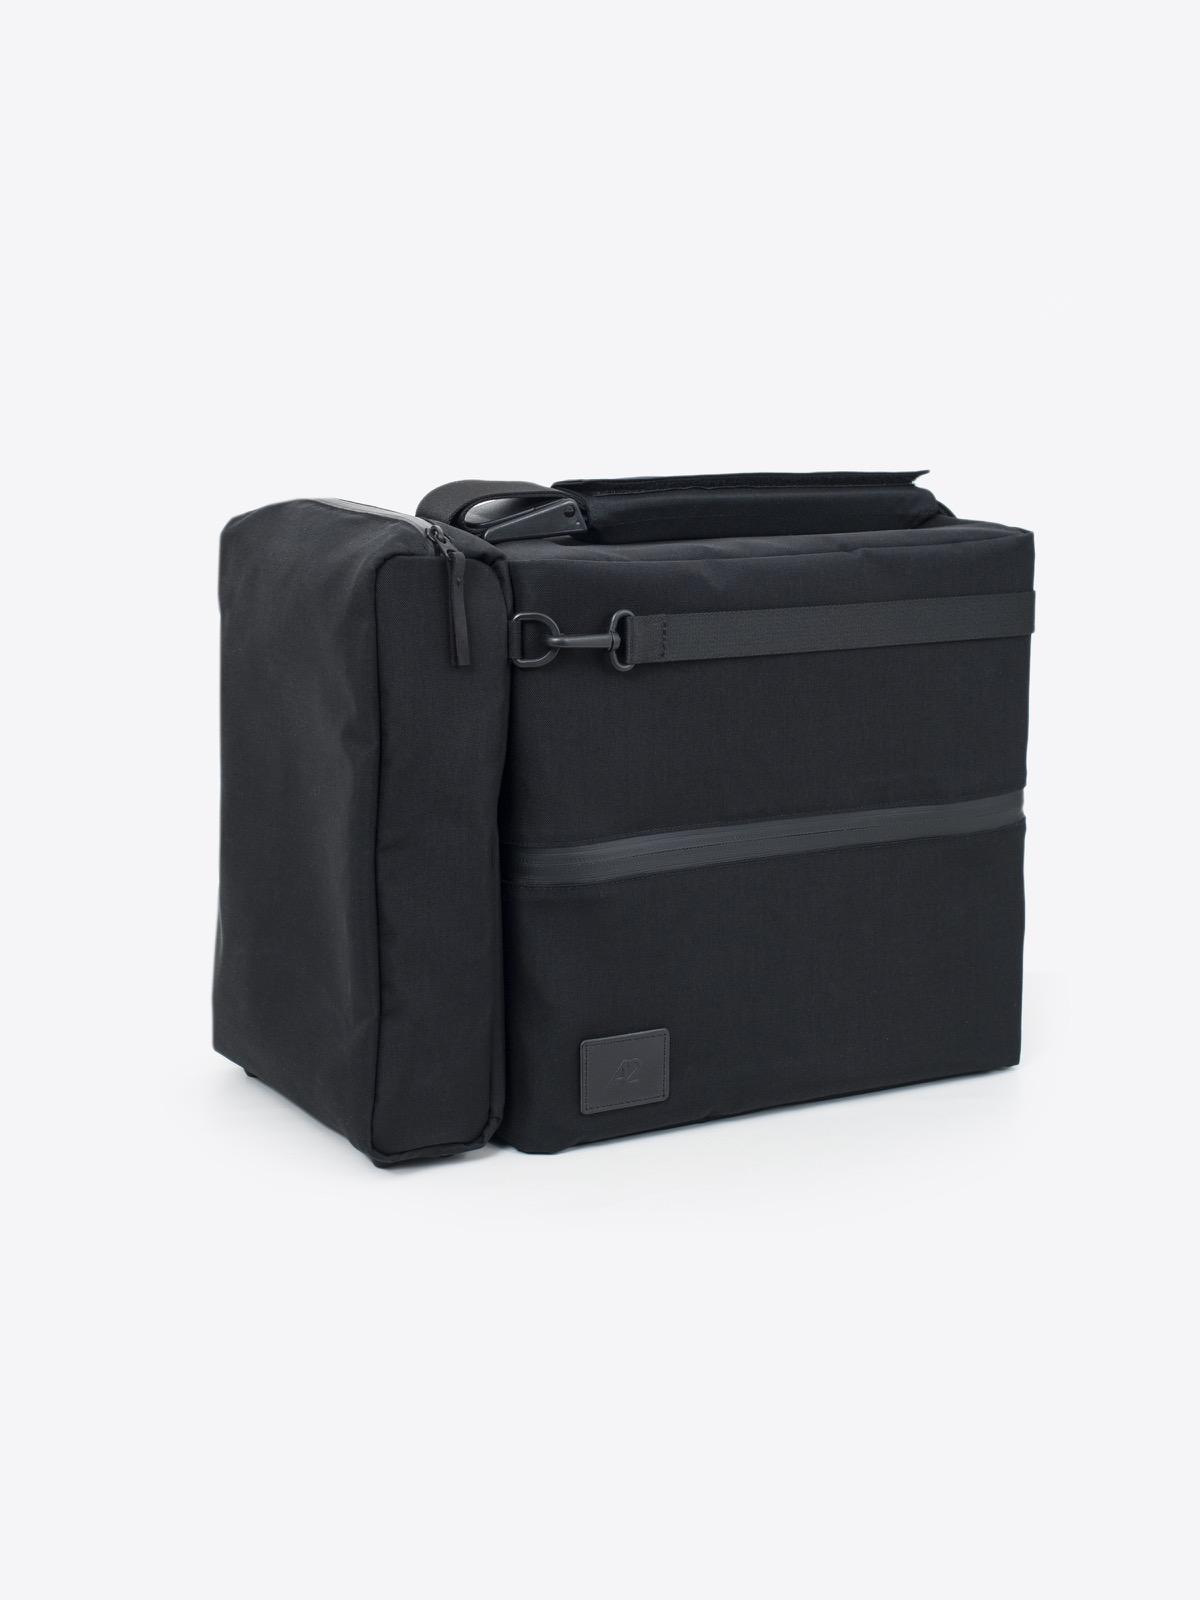 A2 nylon black stealth edition